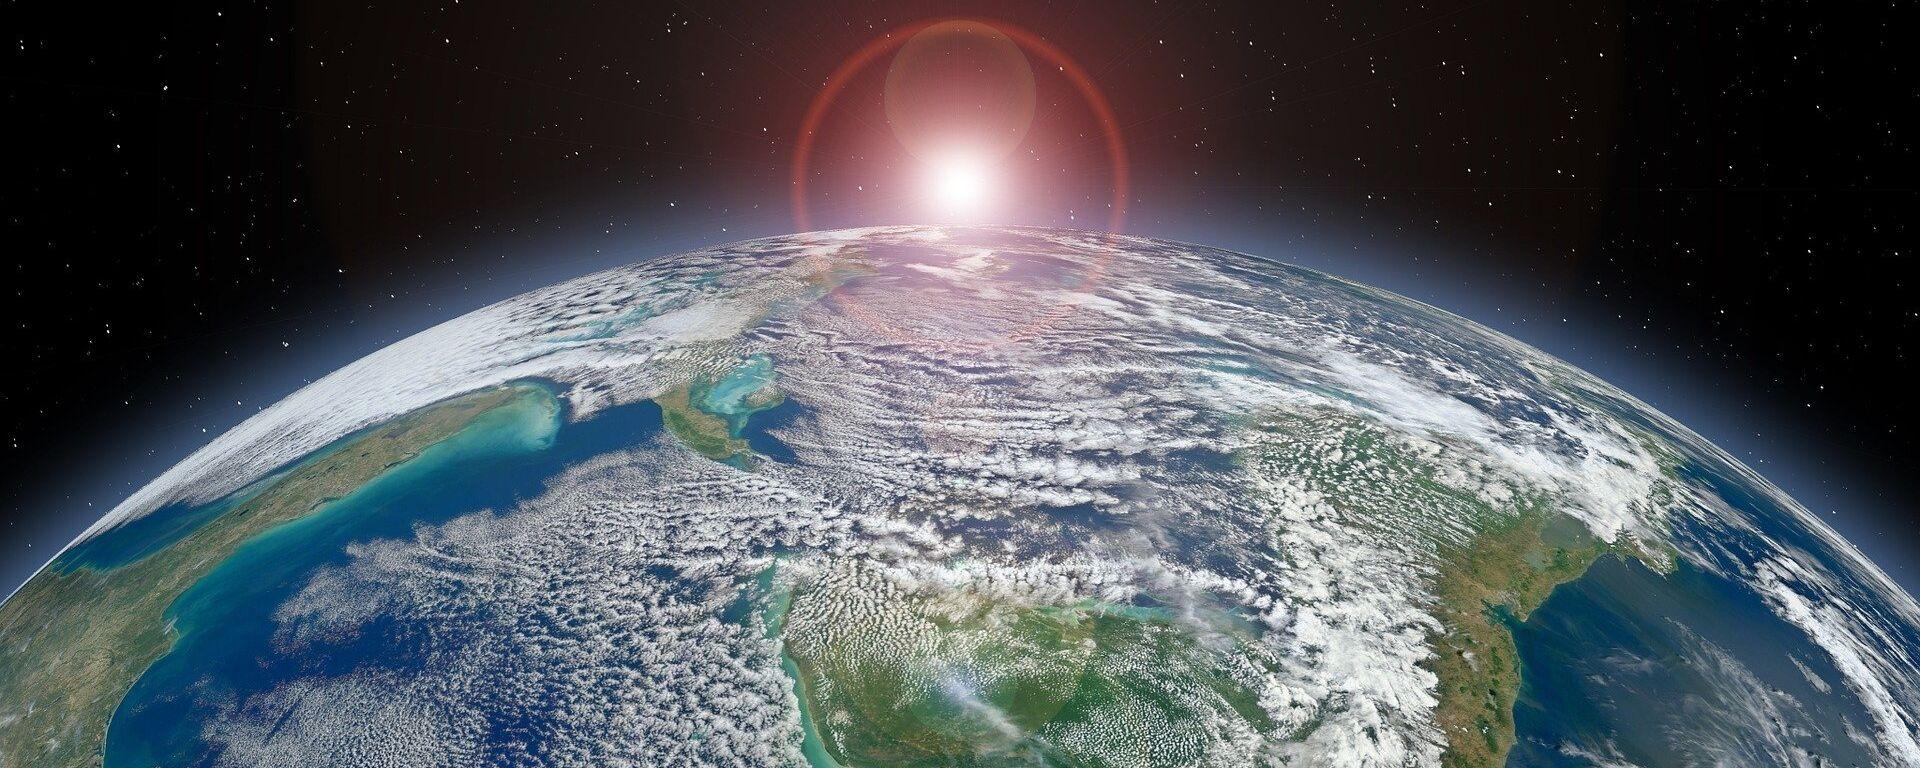 Tierra (imagen referencial) - Sputnik Mundo, 1920, 17.02.2021